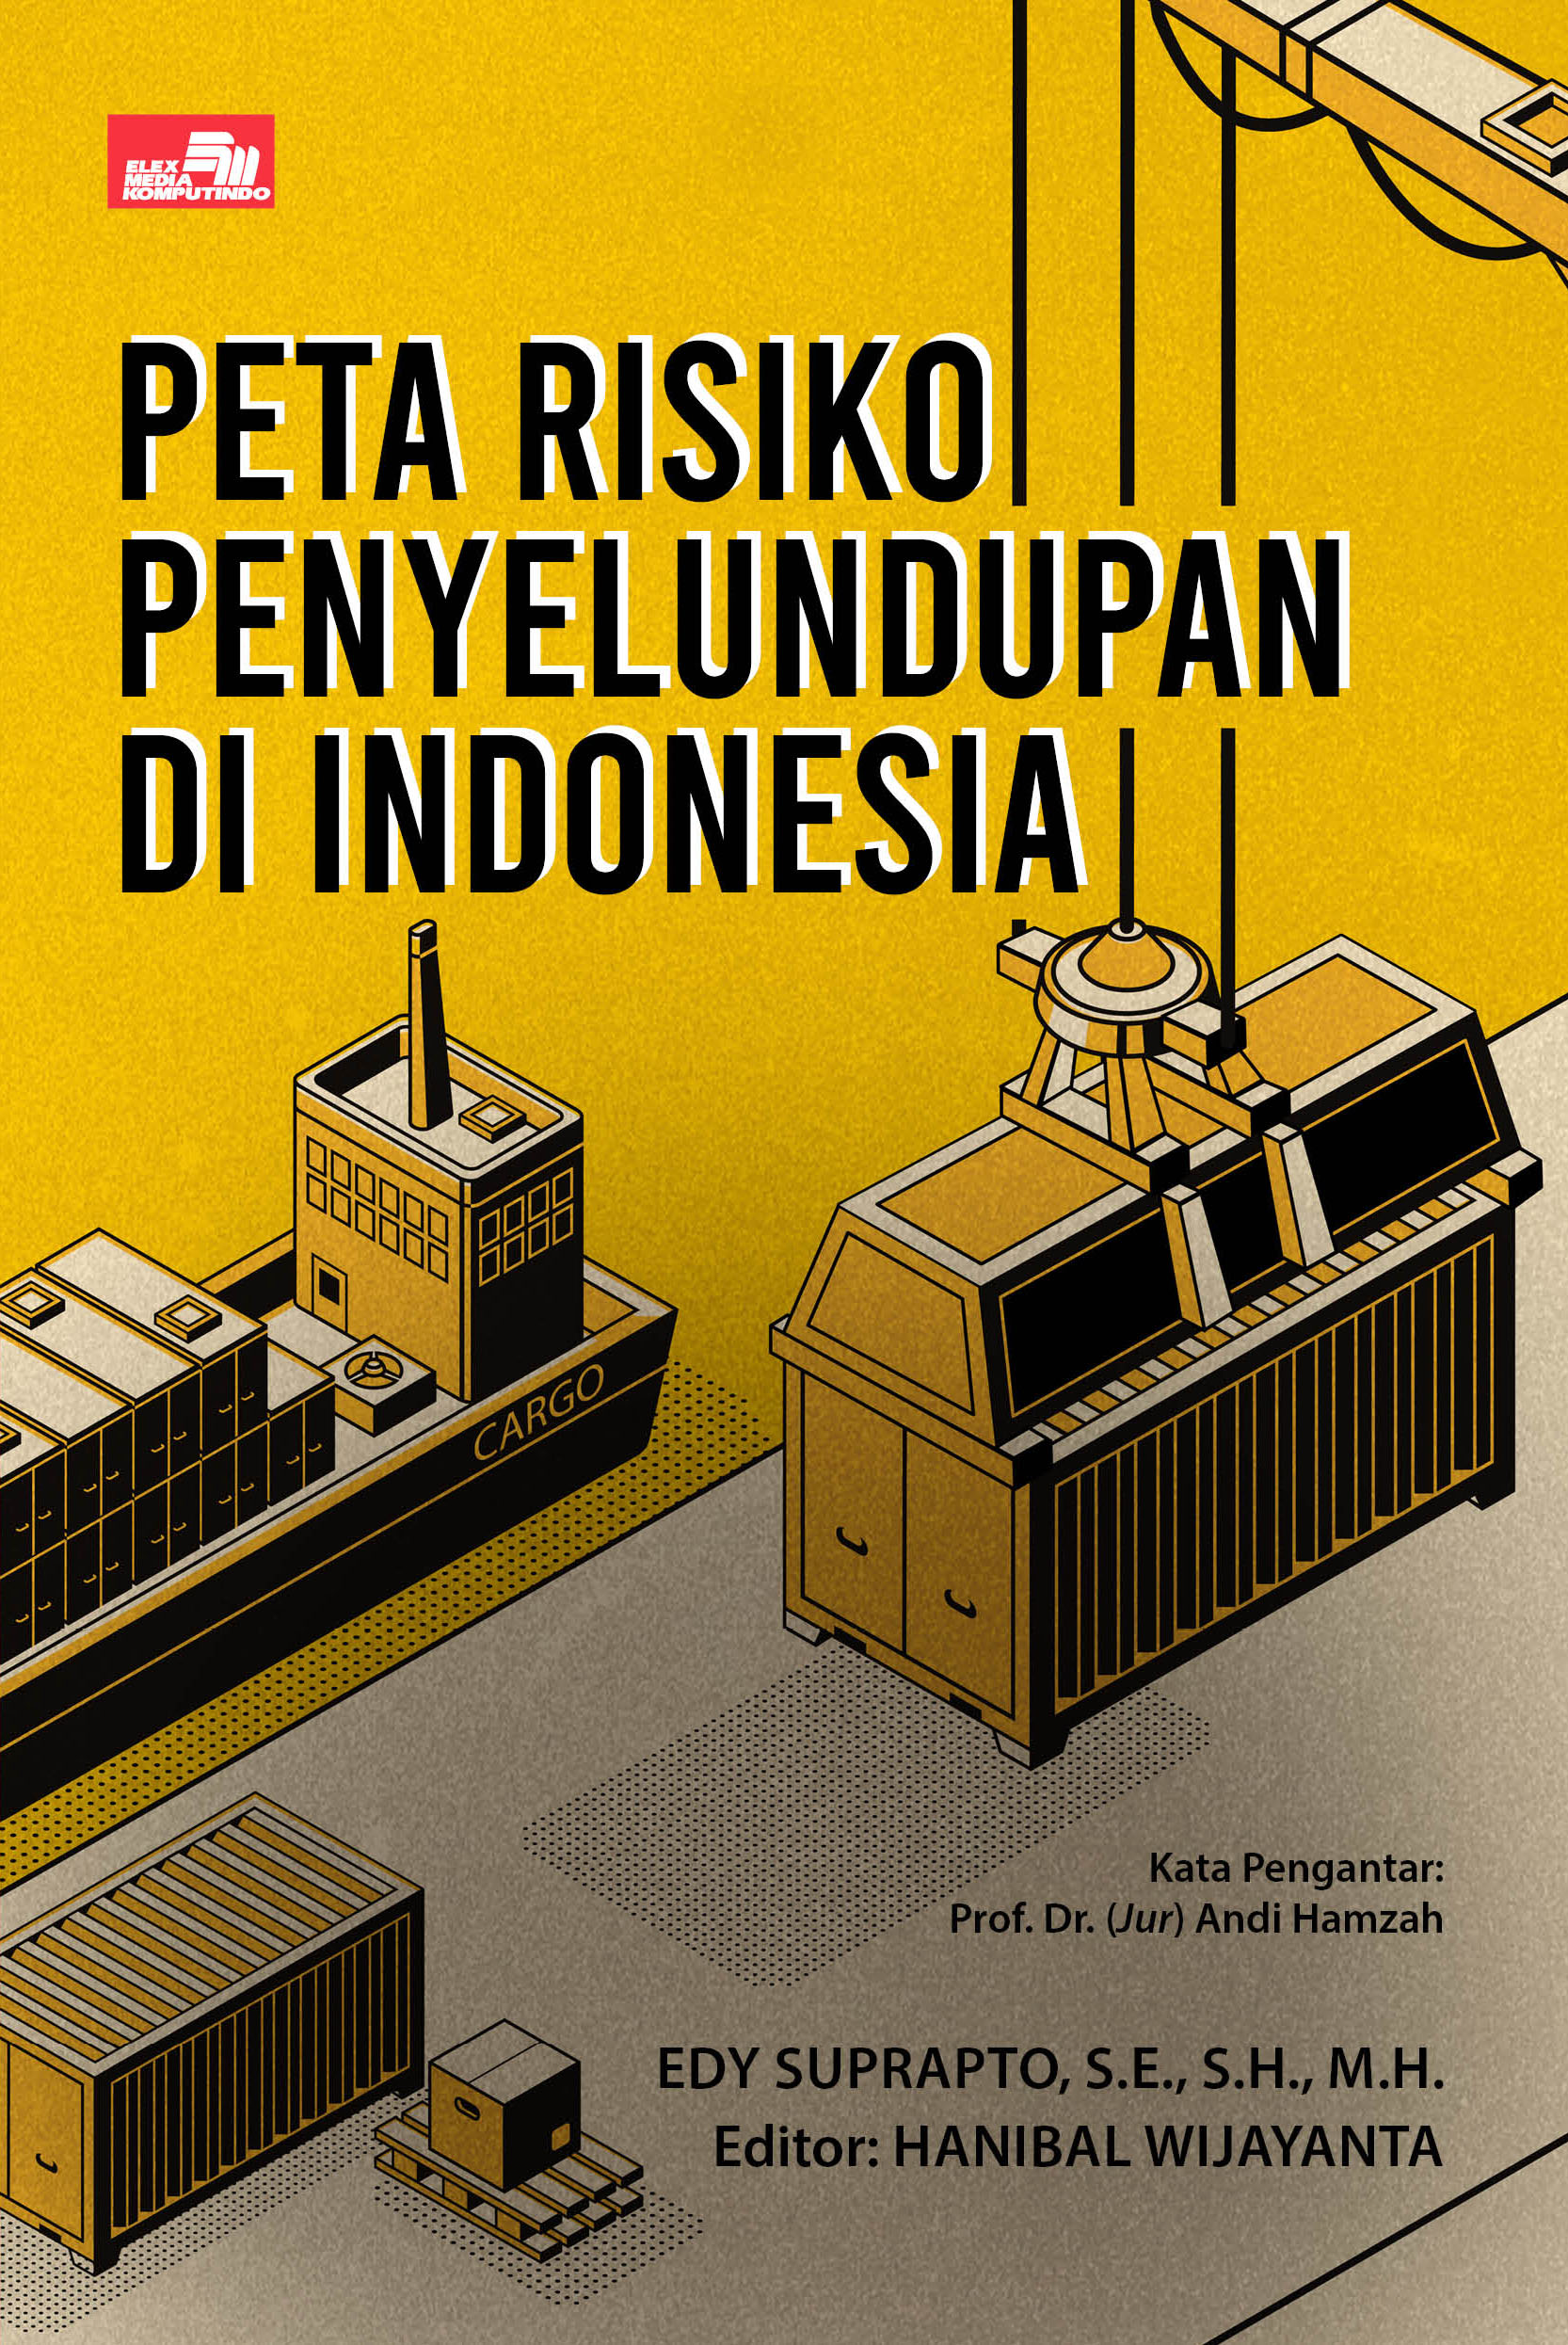 Peta Risiko Penyelundupan di Indonesia Edy Suprapto, S.E, S.H, M.H